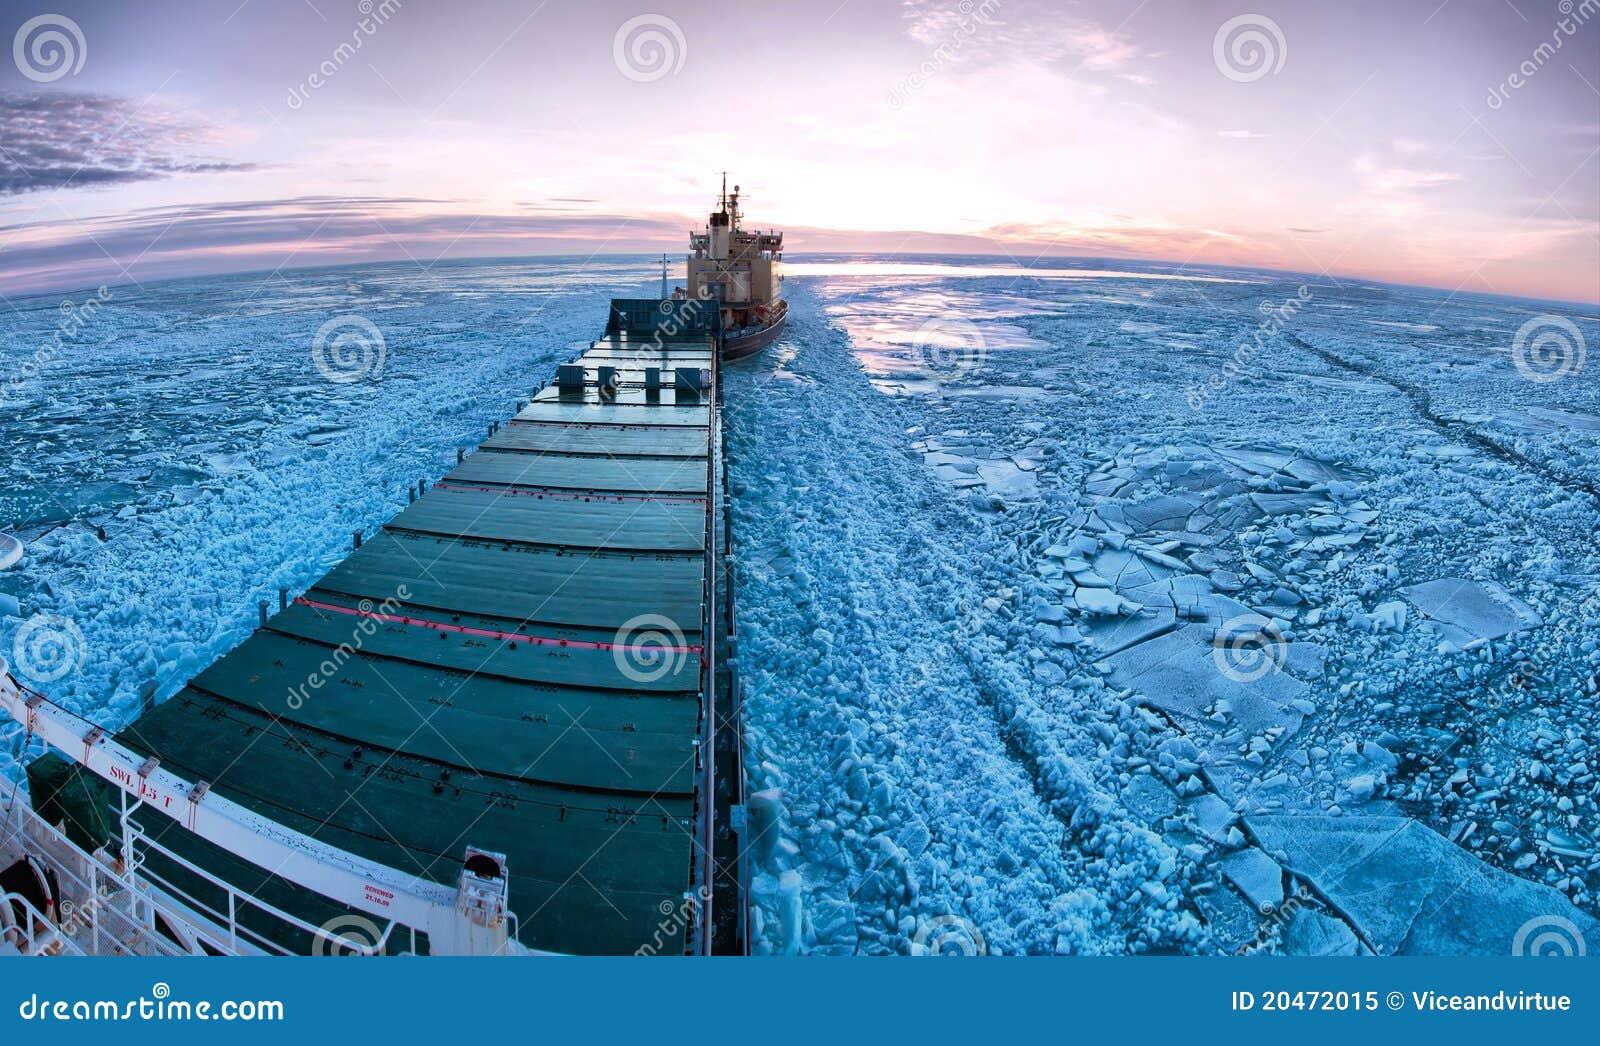 Icebreaker towing cargo ship